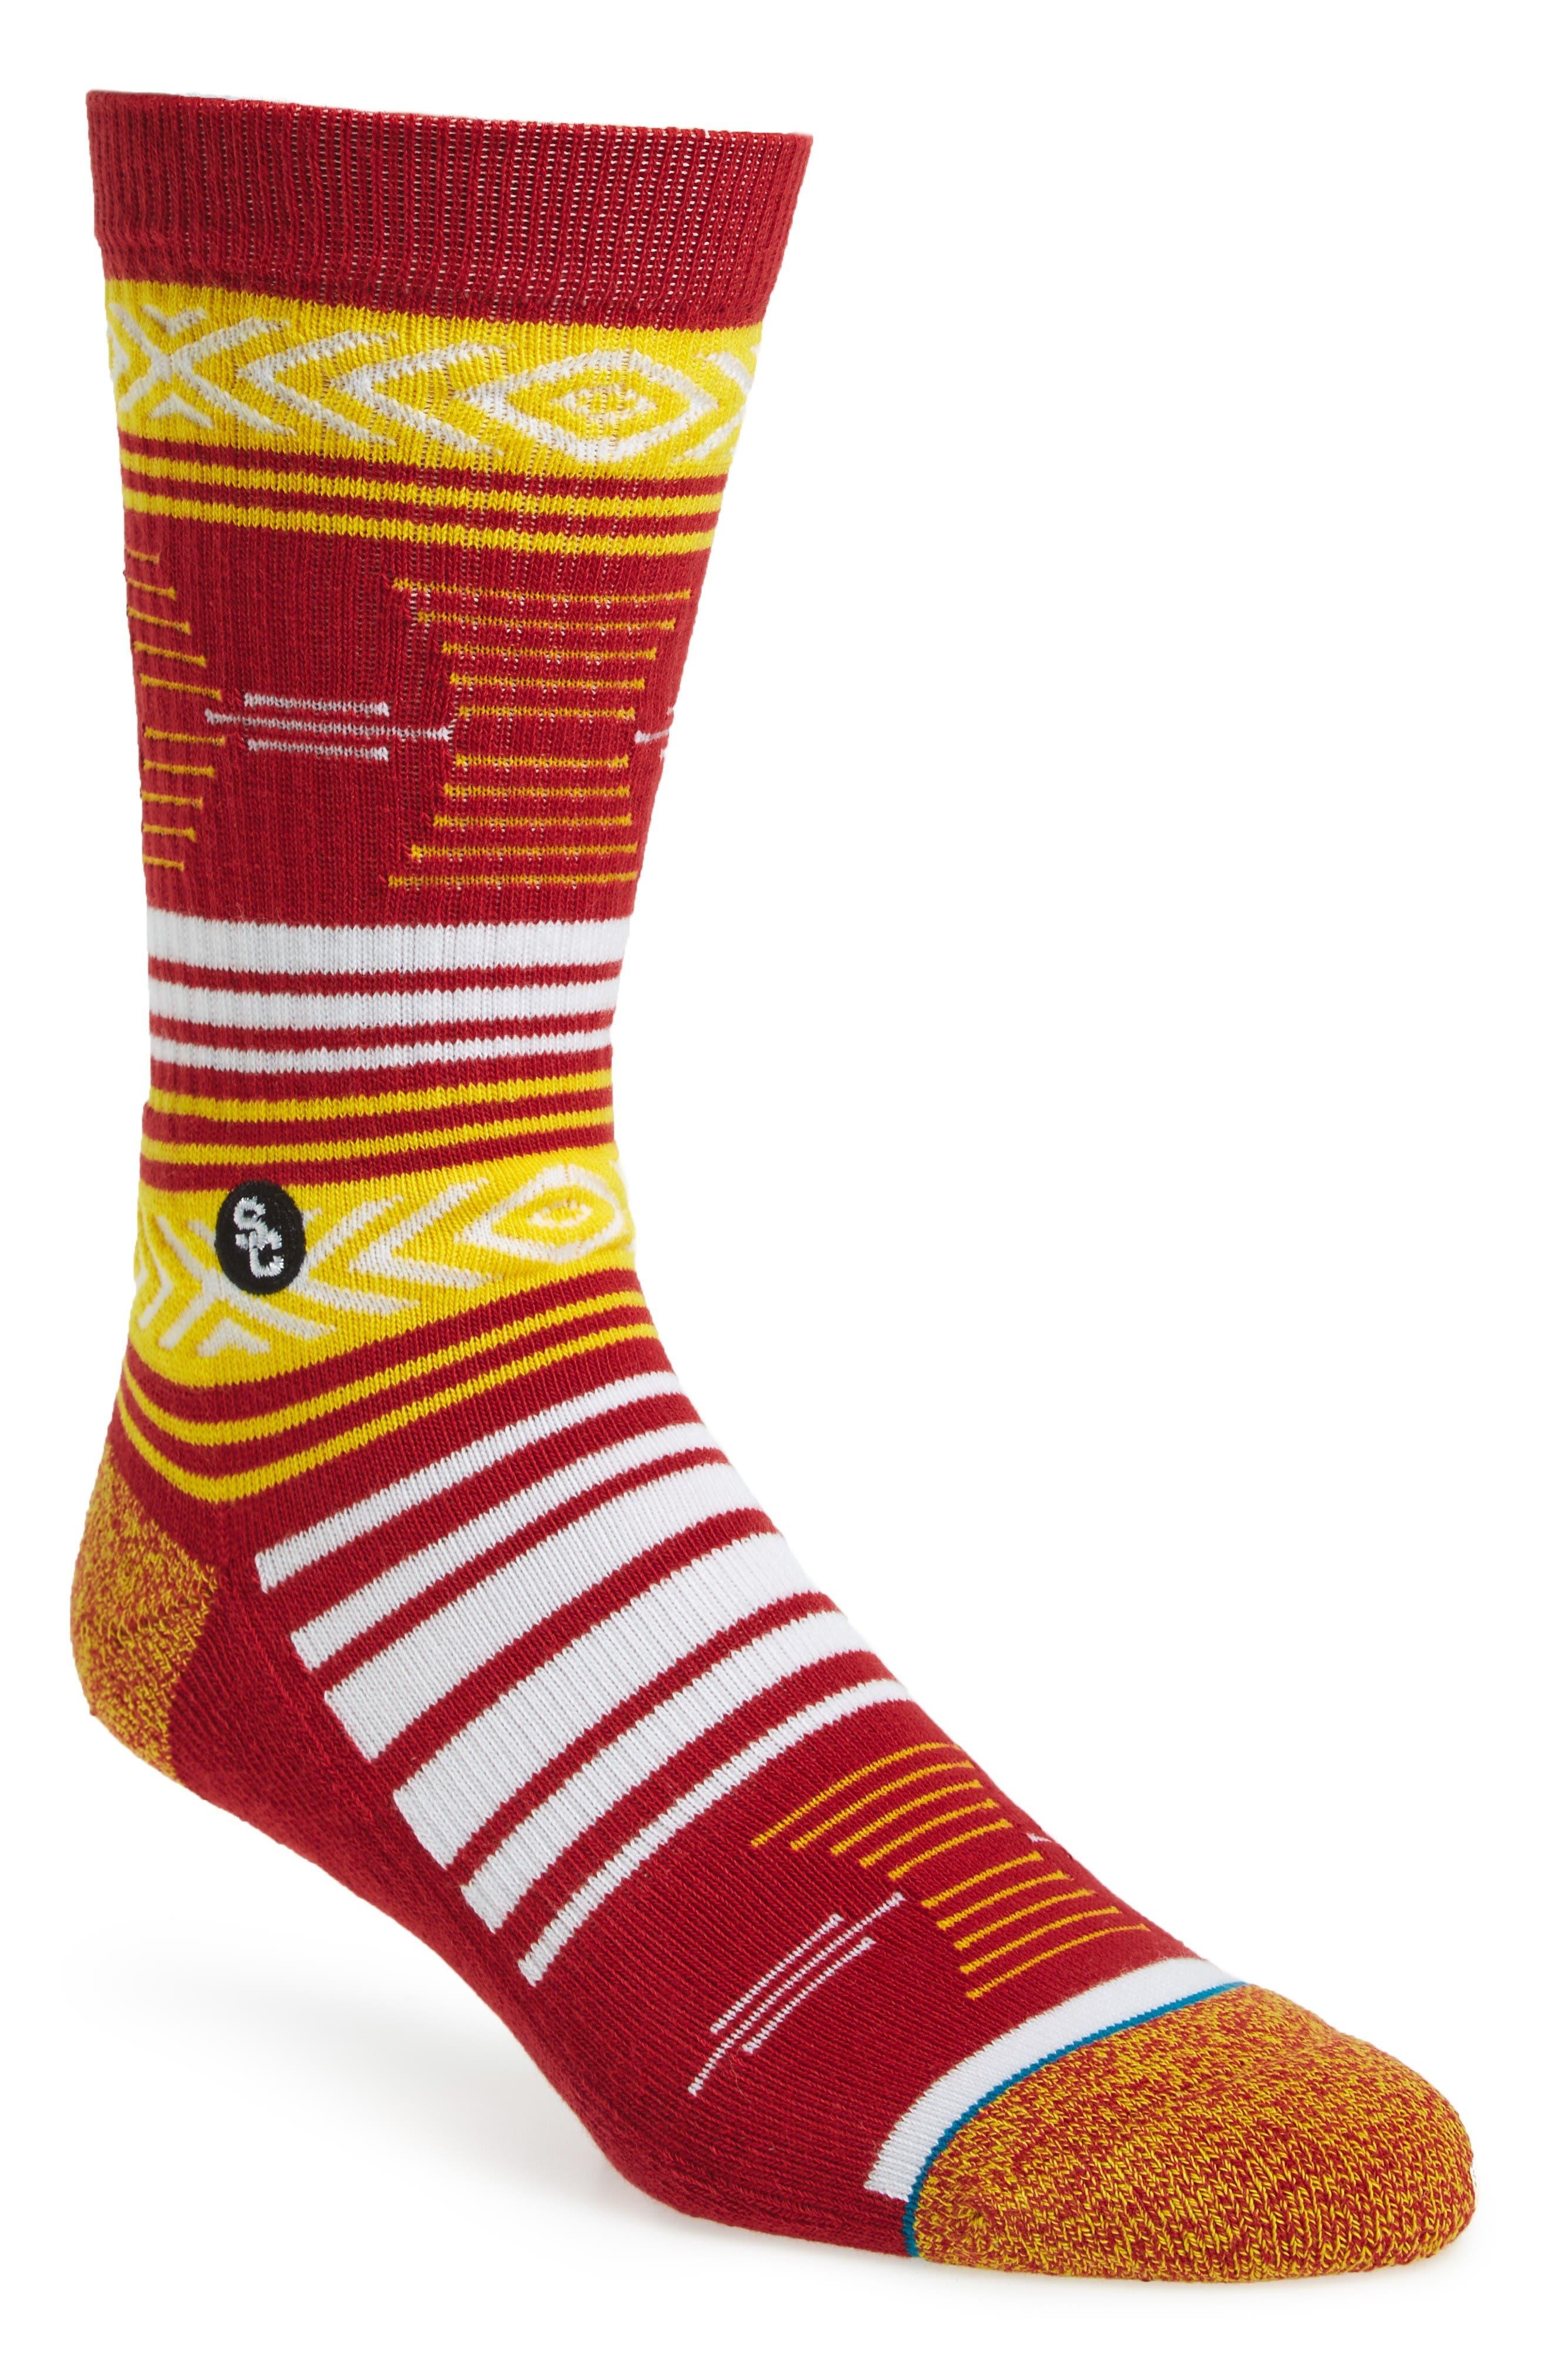 Main Image - Stance Mazed USC Trojans Socks